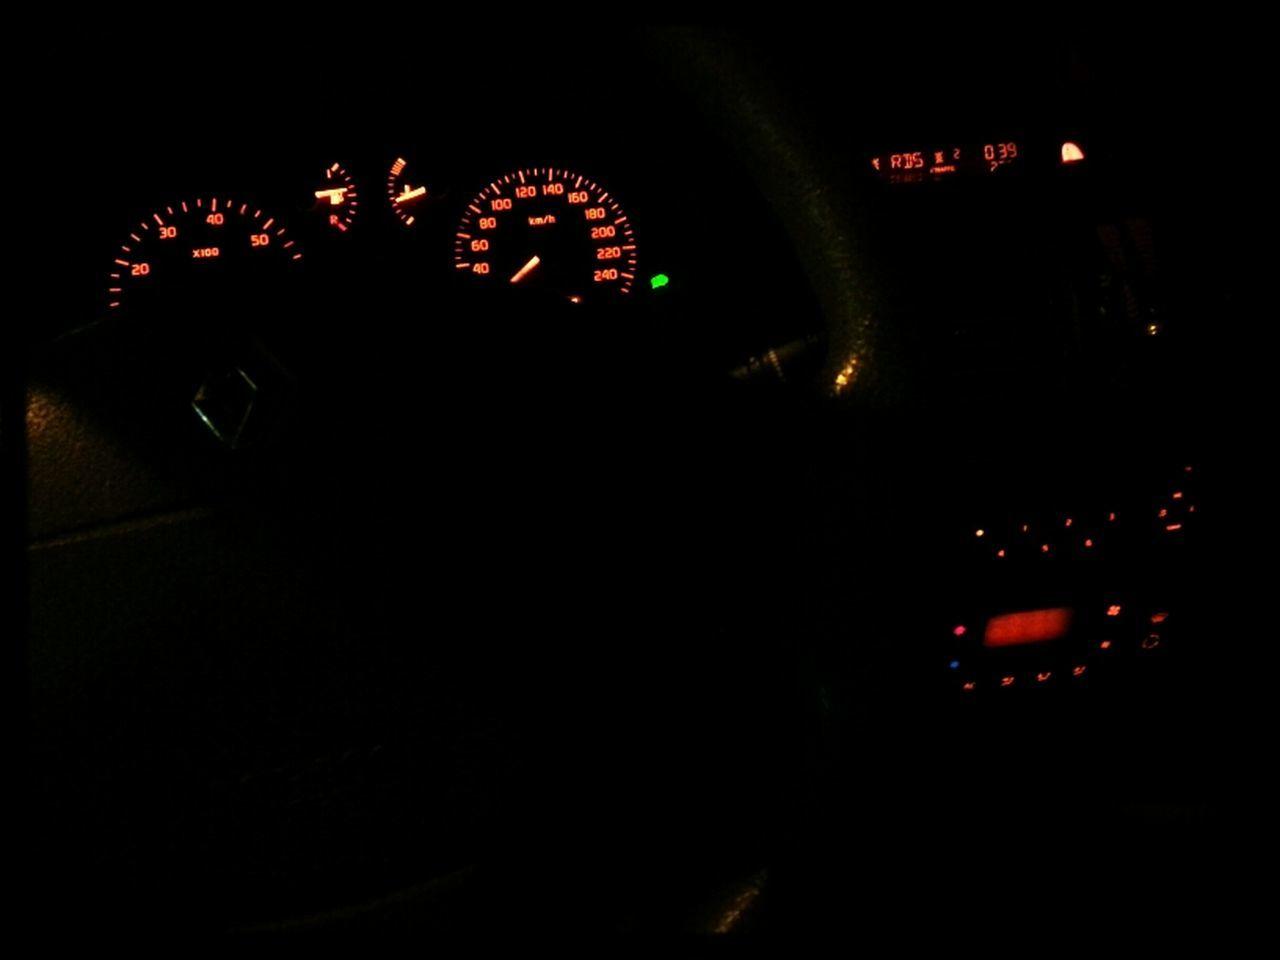 vehicle interior, car interior, night, illuminated, car, speedometer, mode of transport, transportation, dashboard, control panel, land vehicle, dark, gauge, men, two people, real people, indoors, people